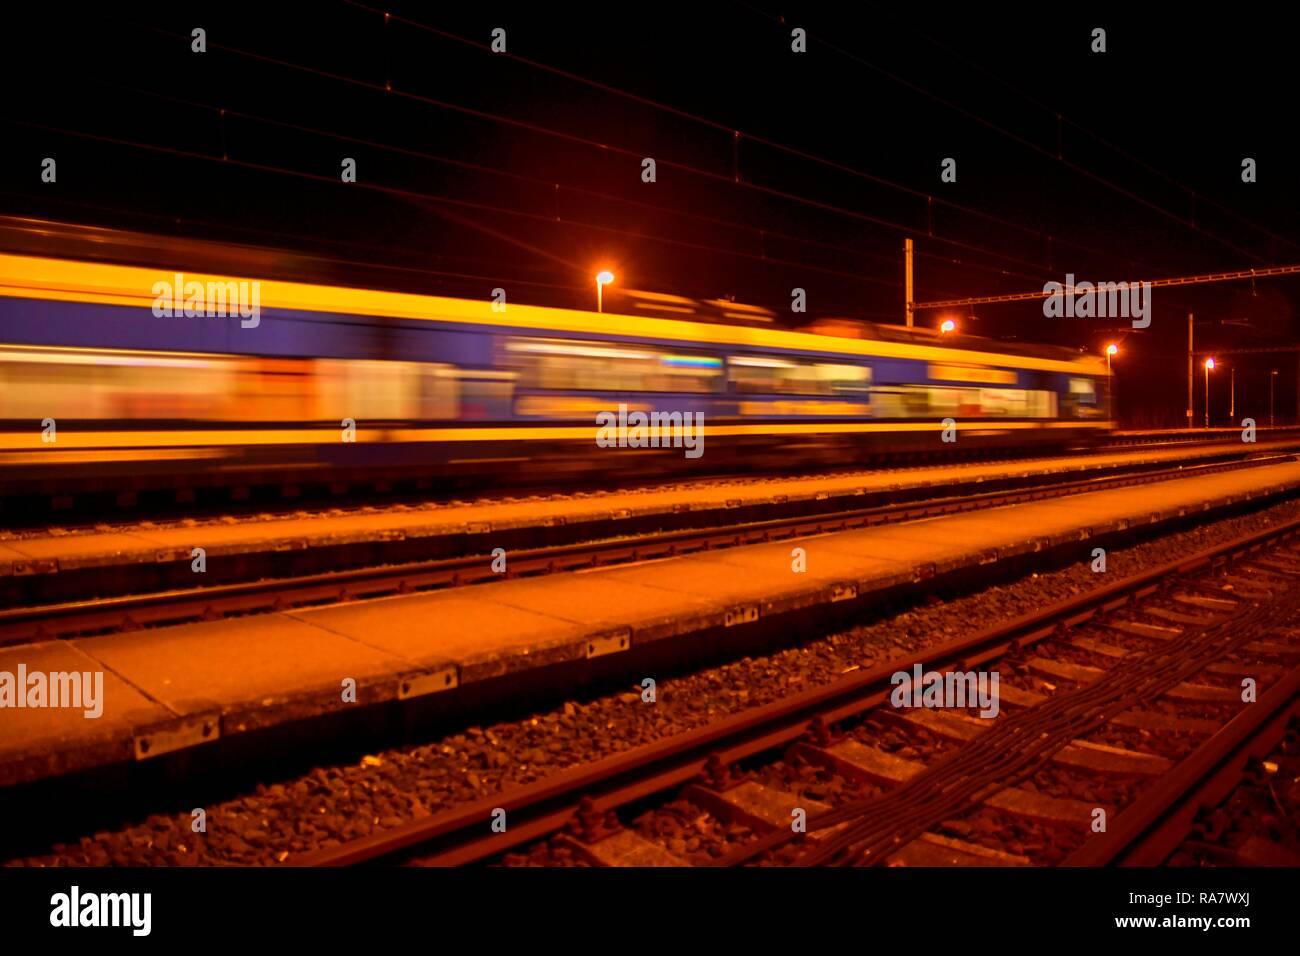 Passenger train on railroad tracks at night  Blurred motion - Stock Image